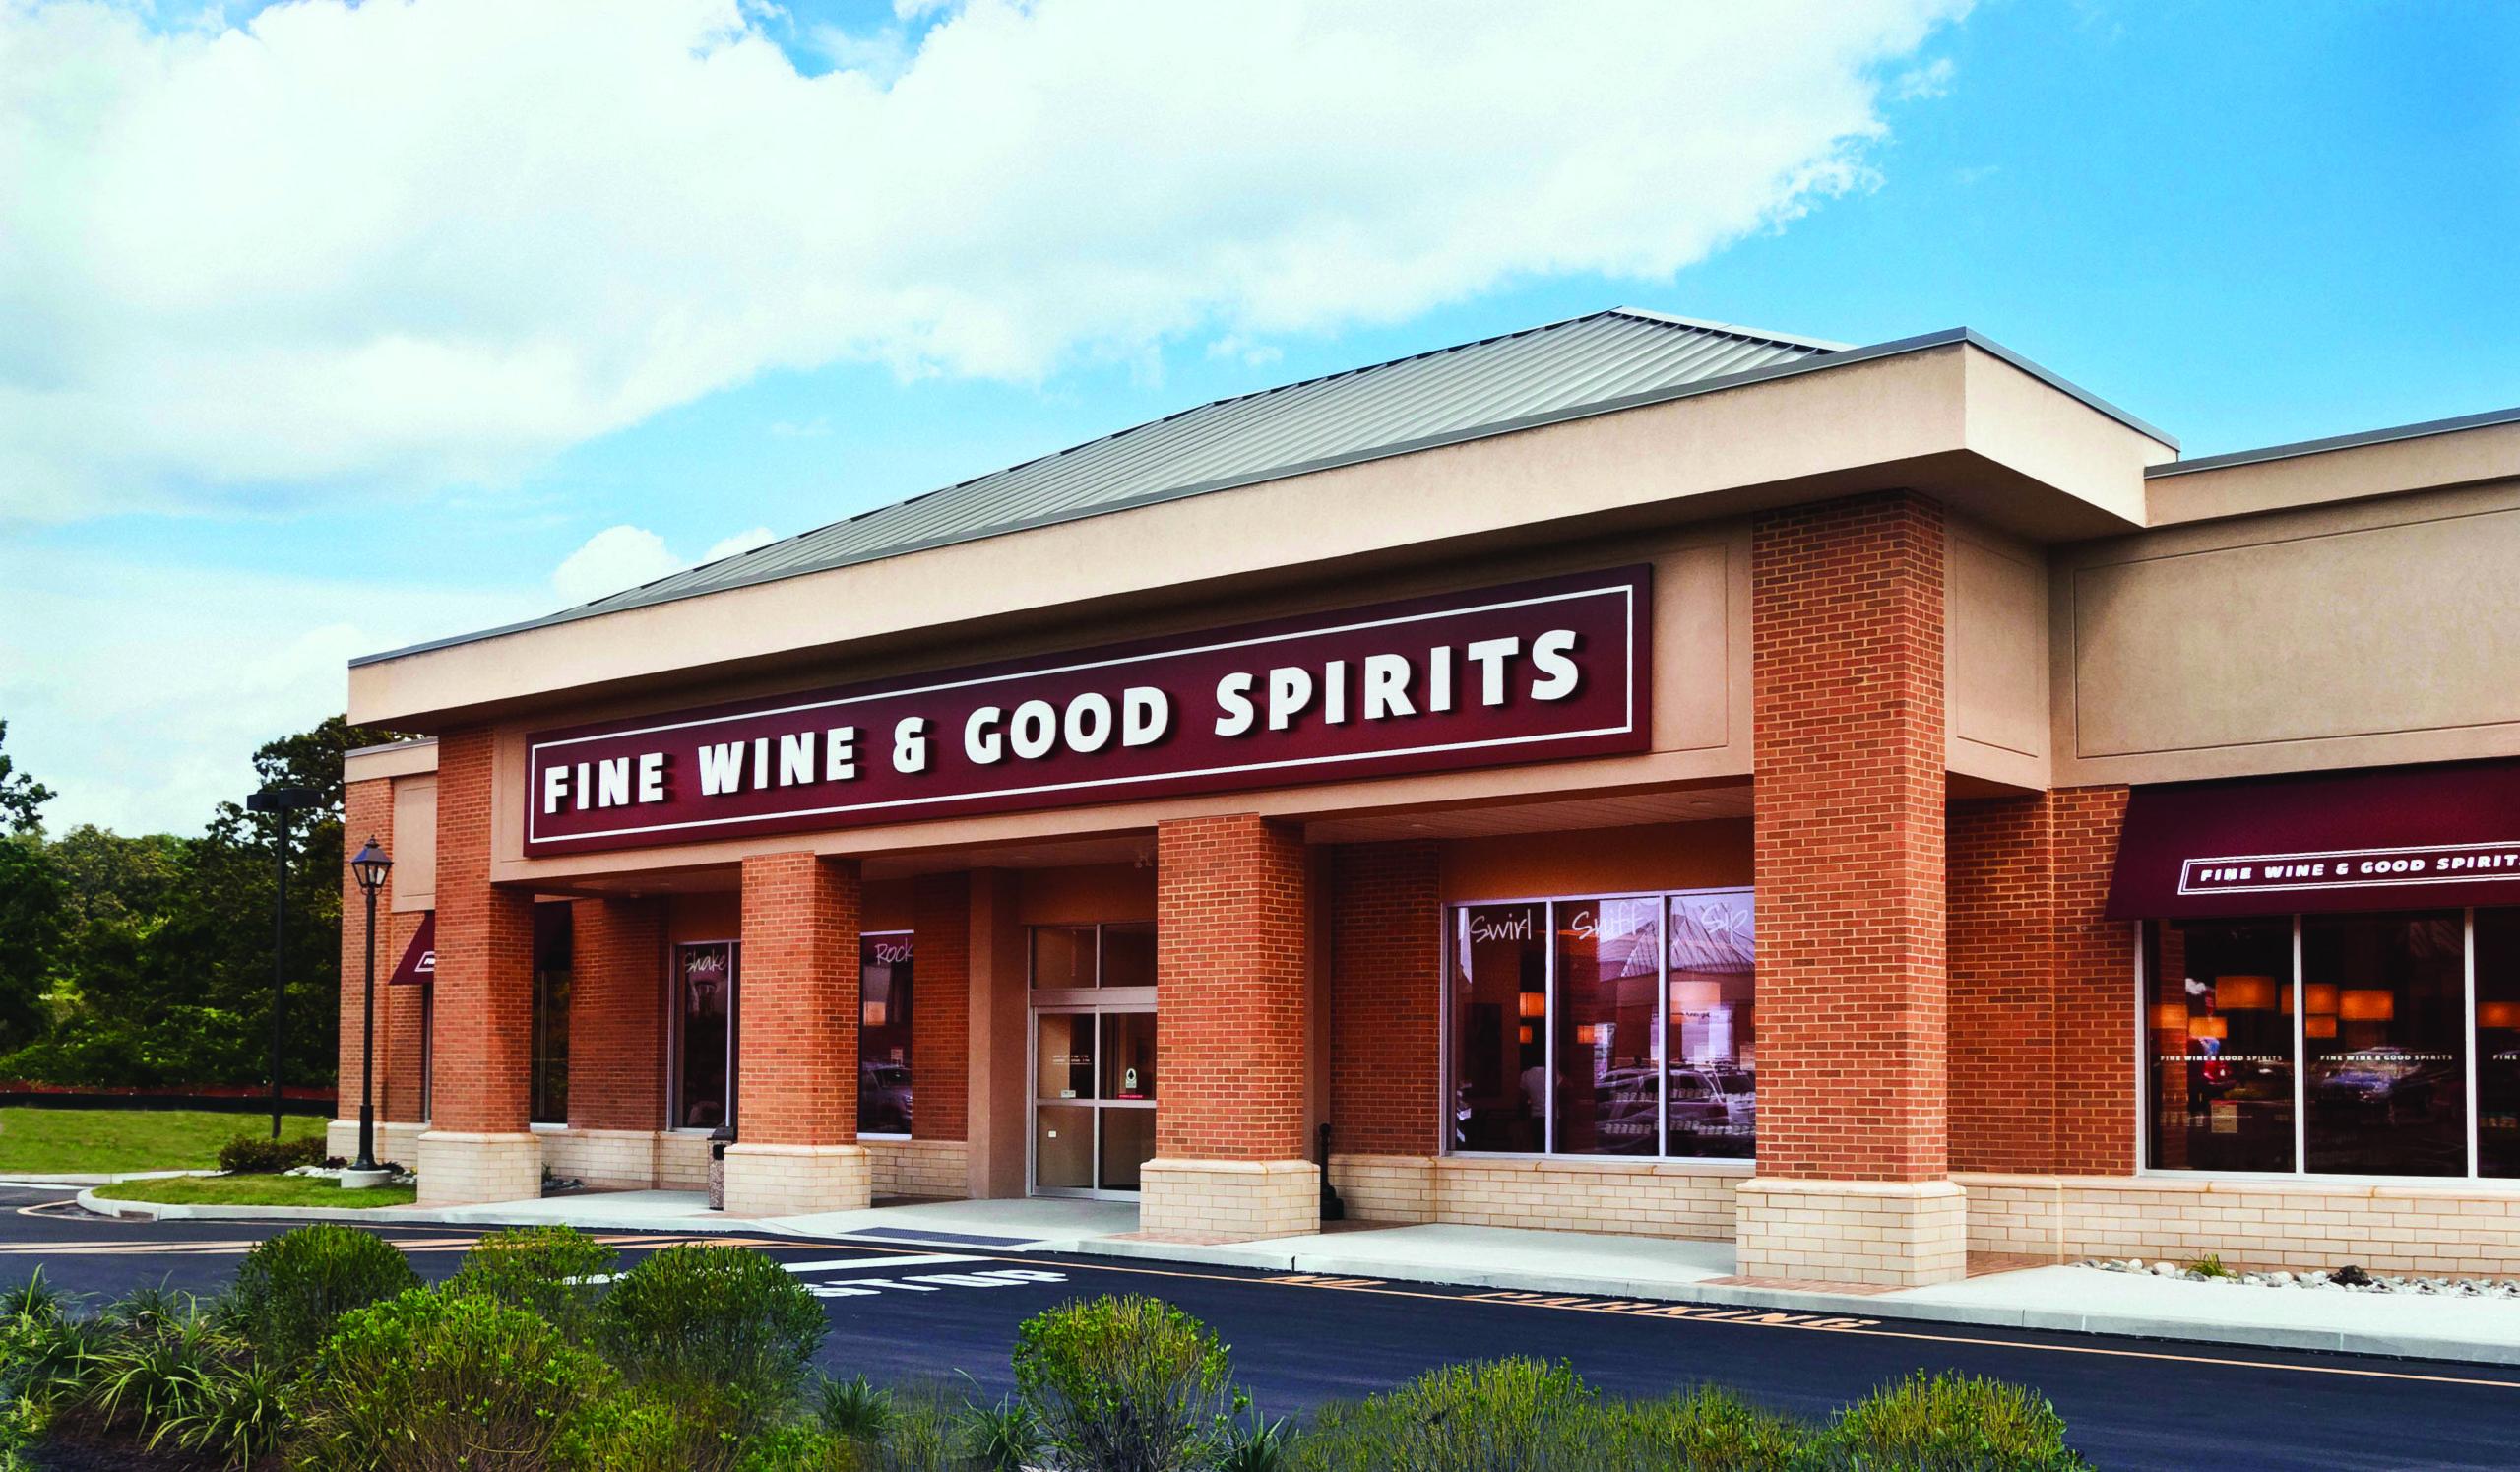 PLCB's Fine Wine & Good Spirits in Dresher Unveils New Look